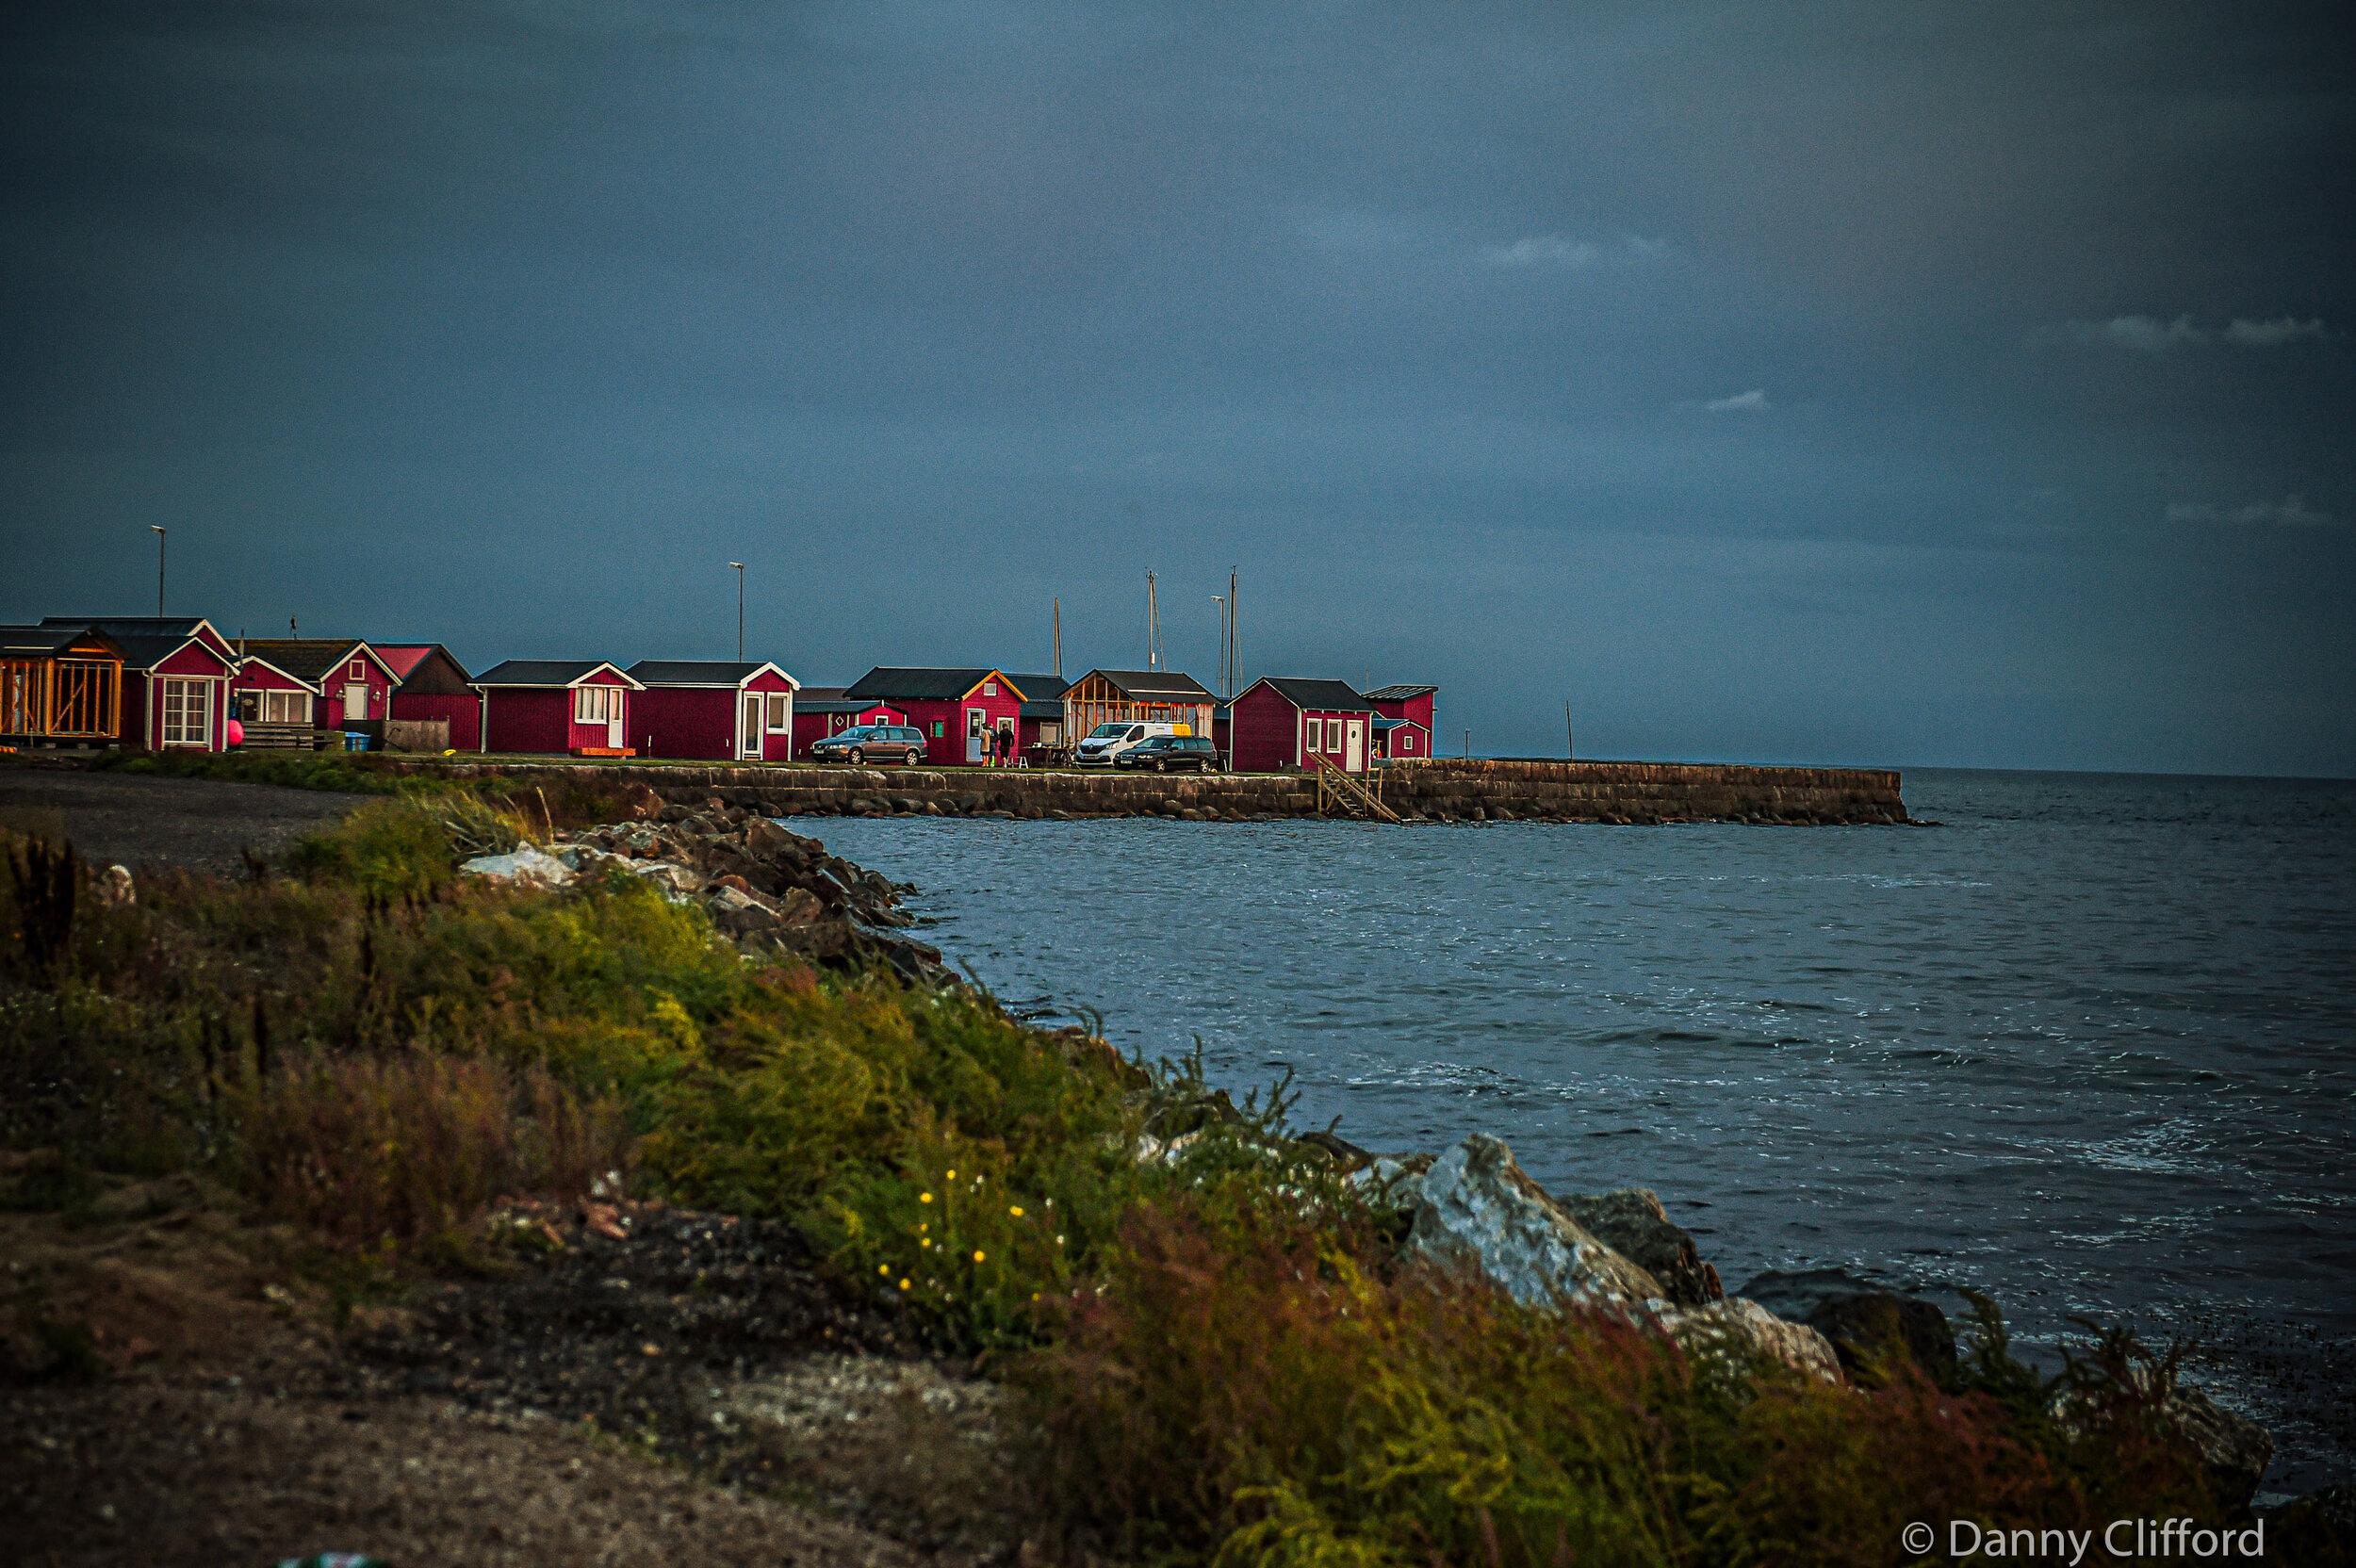 A typical Swedish coast at dusk.